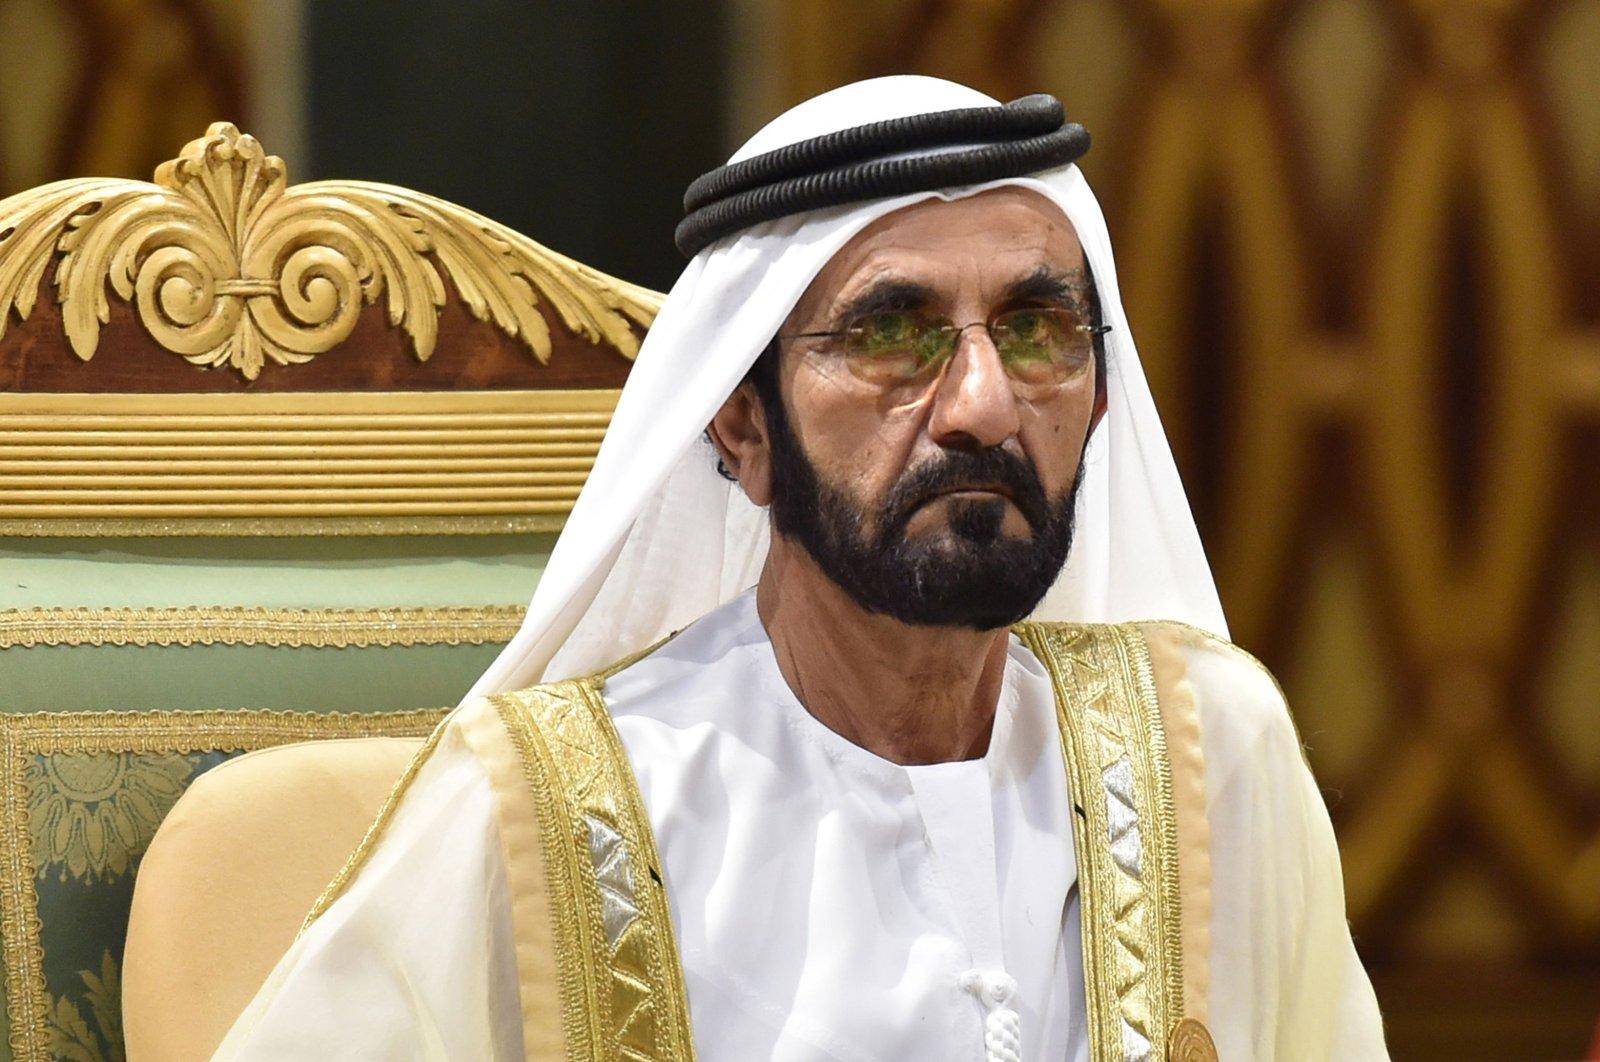 Dubai's ruler Sheikh Mohammed bin Rashid Al Maktoum attends a session of the 40th Gulf Cooperation Council (GCC) summit held at the Saudi capital Riyadh, Dec. 10, 2019. (AFP Photo)